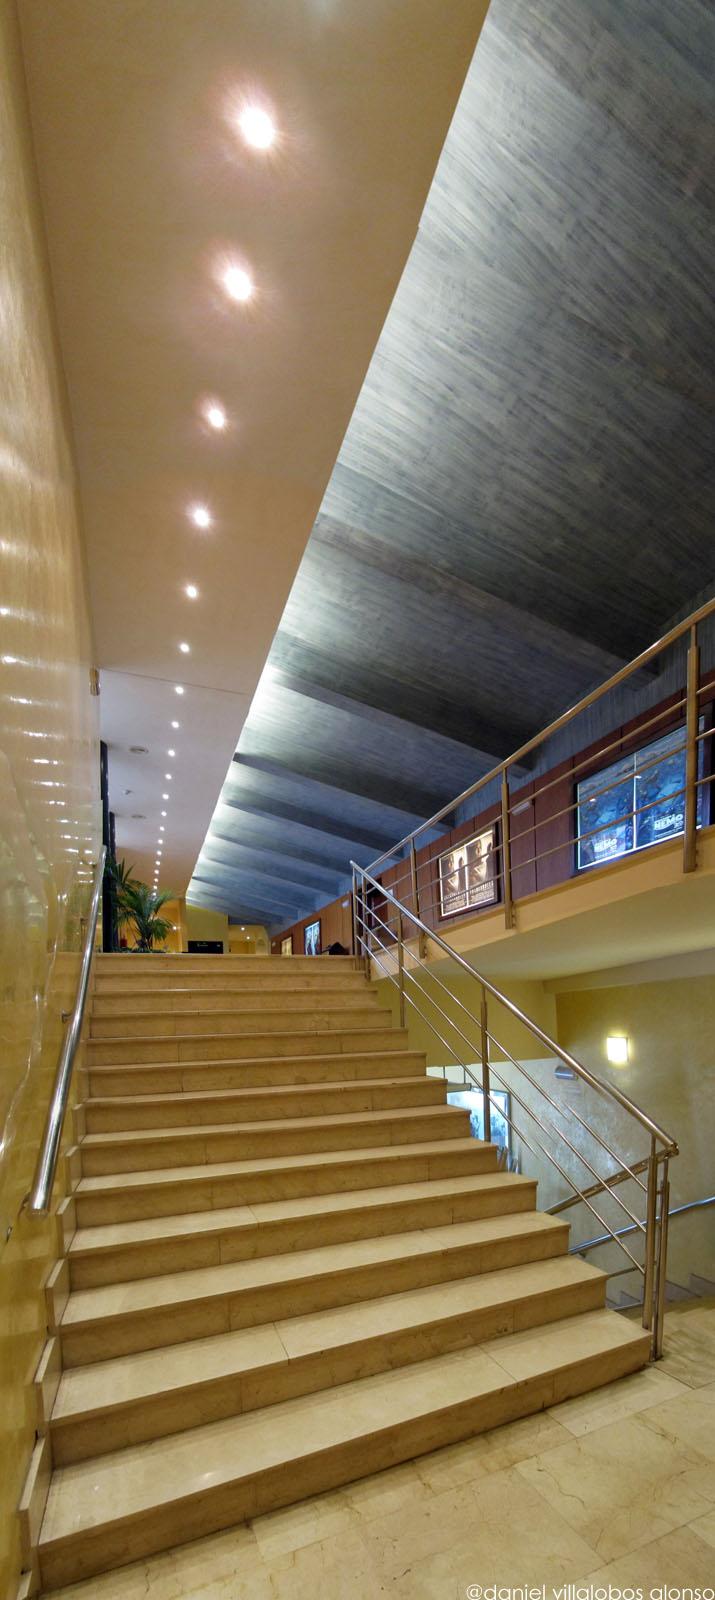 danielvillalobos-cines-digitalphotographies-modernarchitecture-46